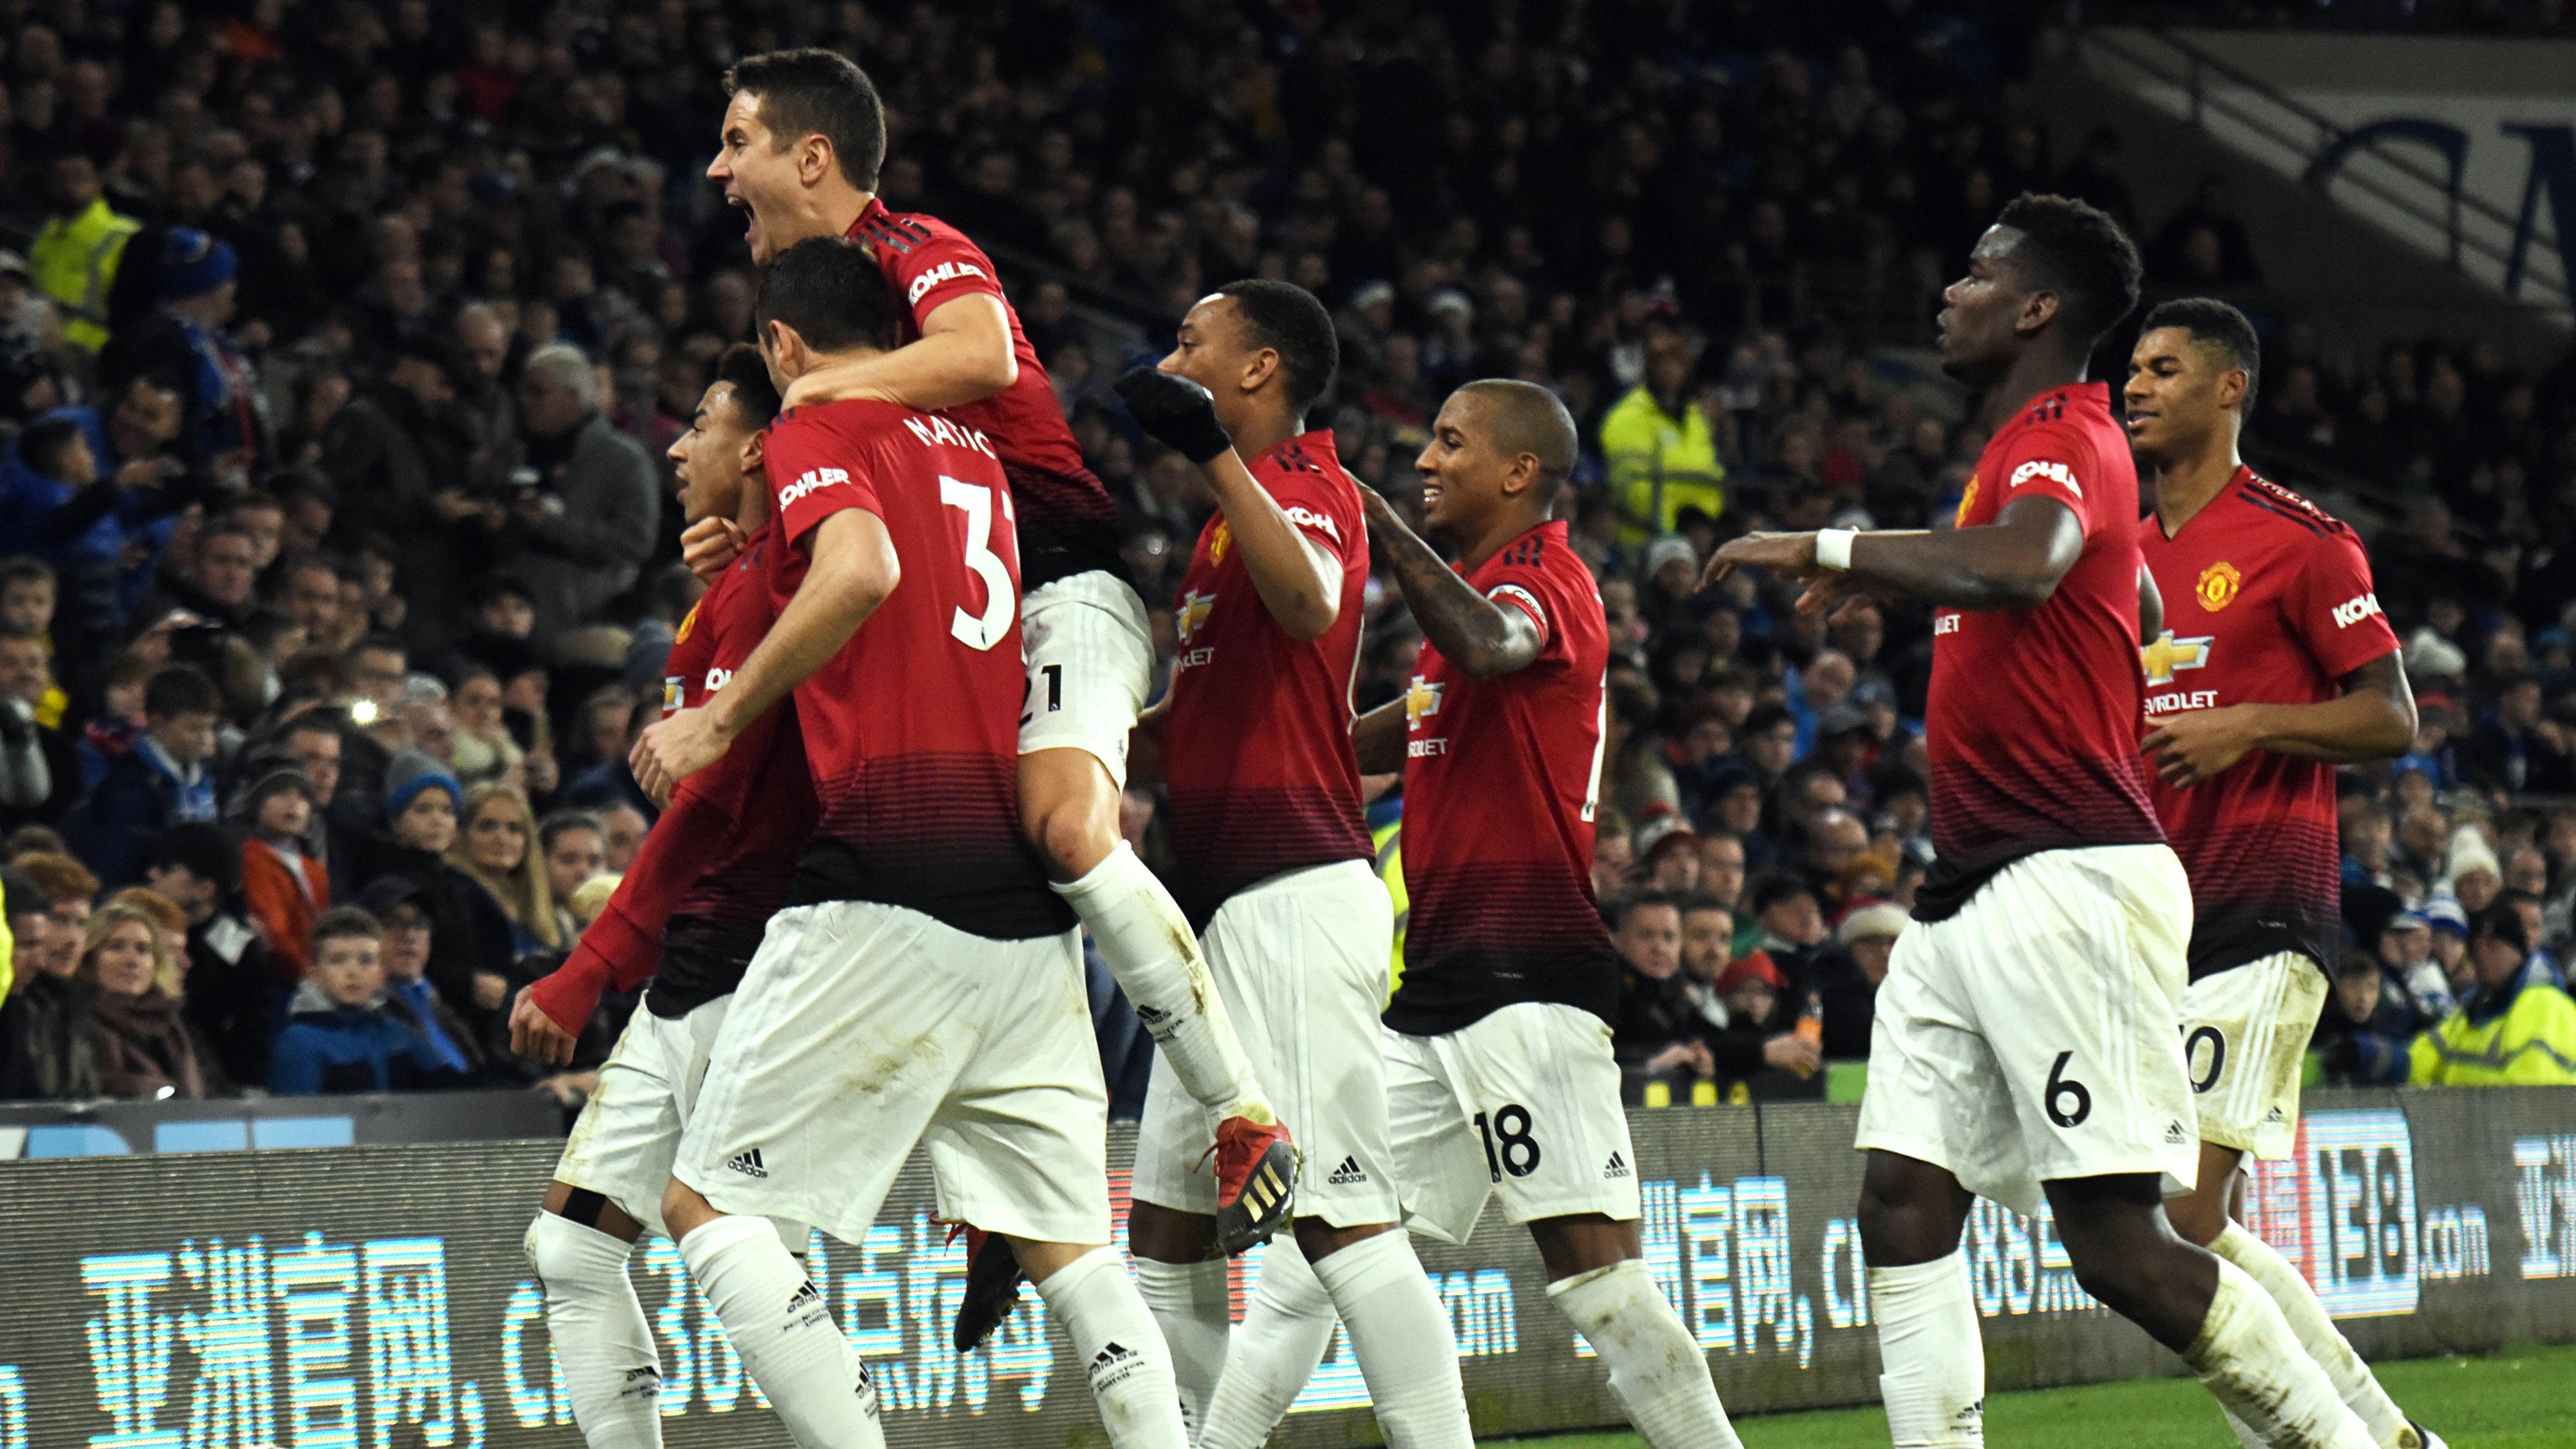 TV 2 Sumo lanserer Premier League i 4K